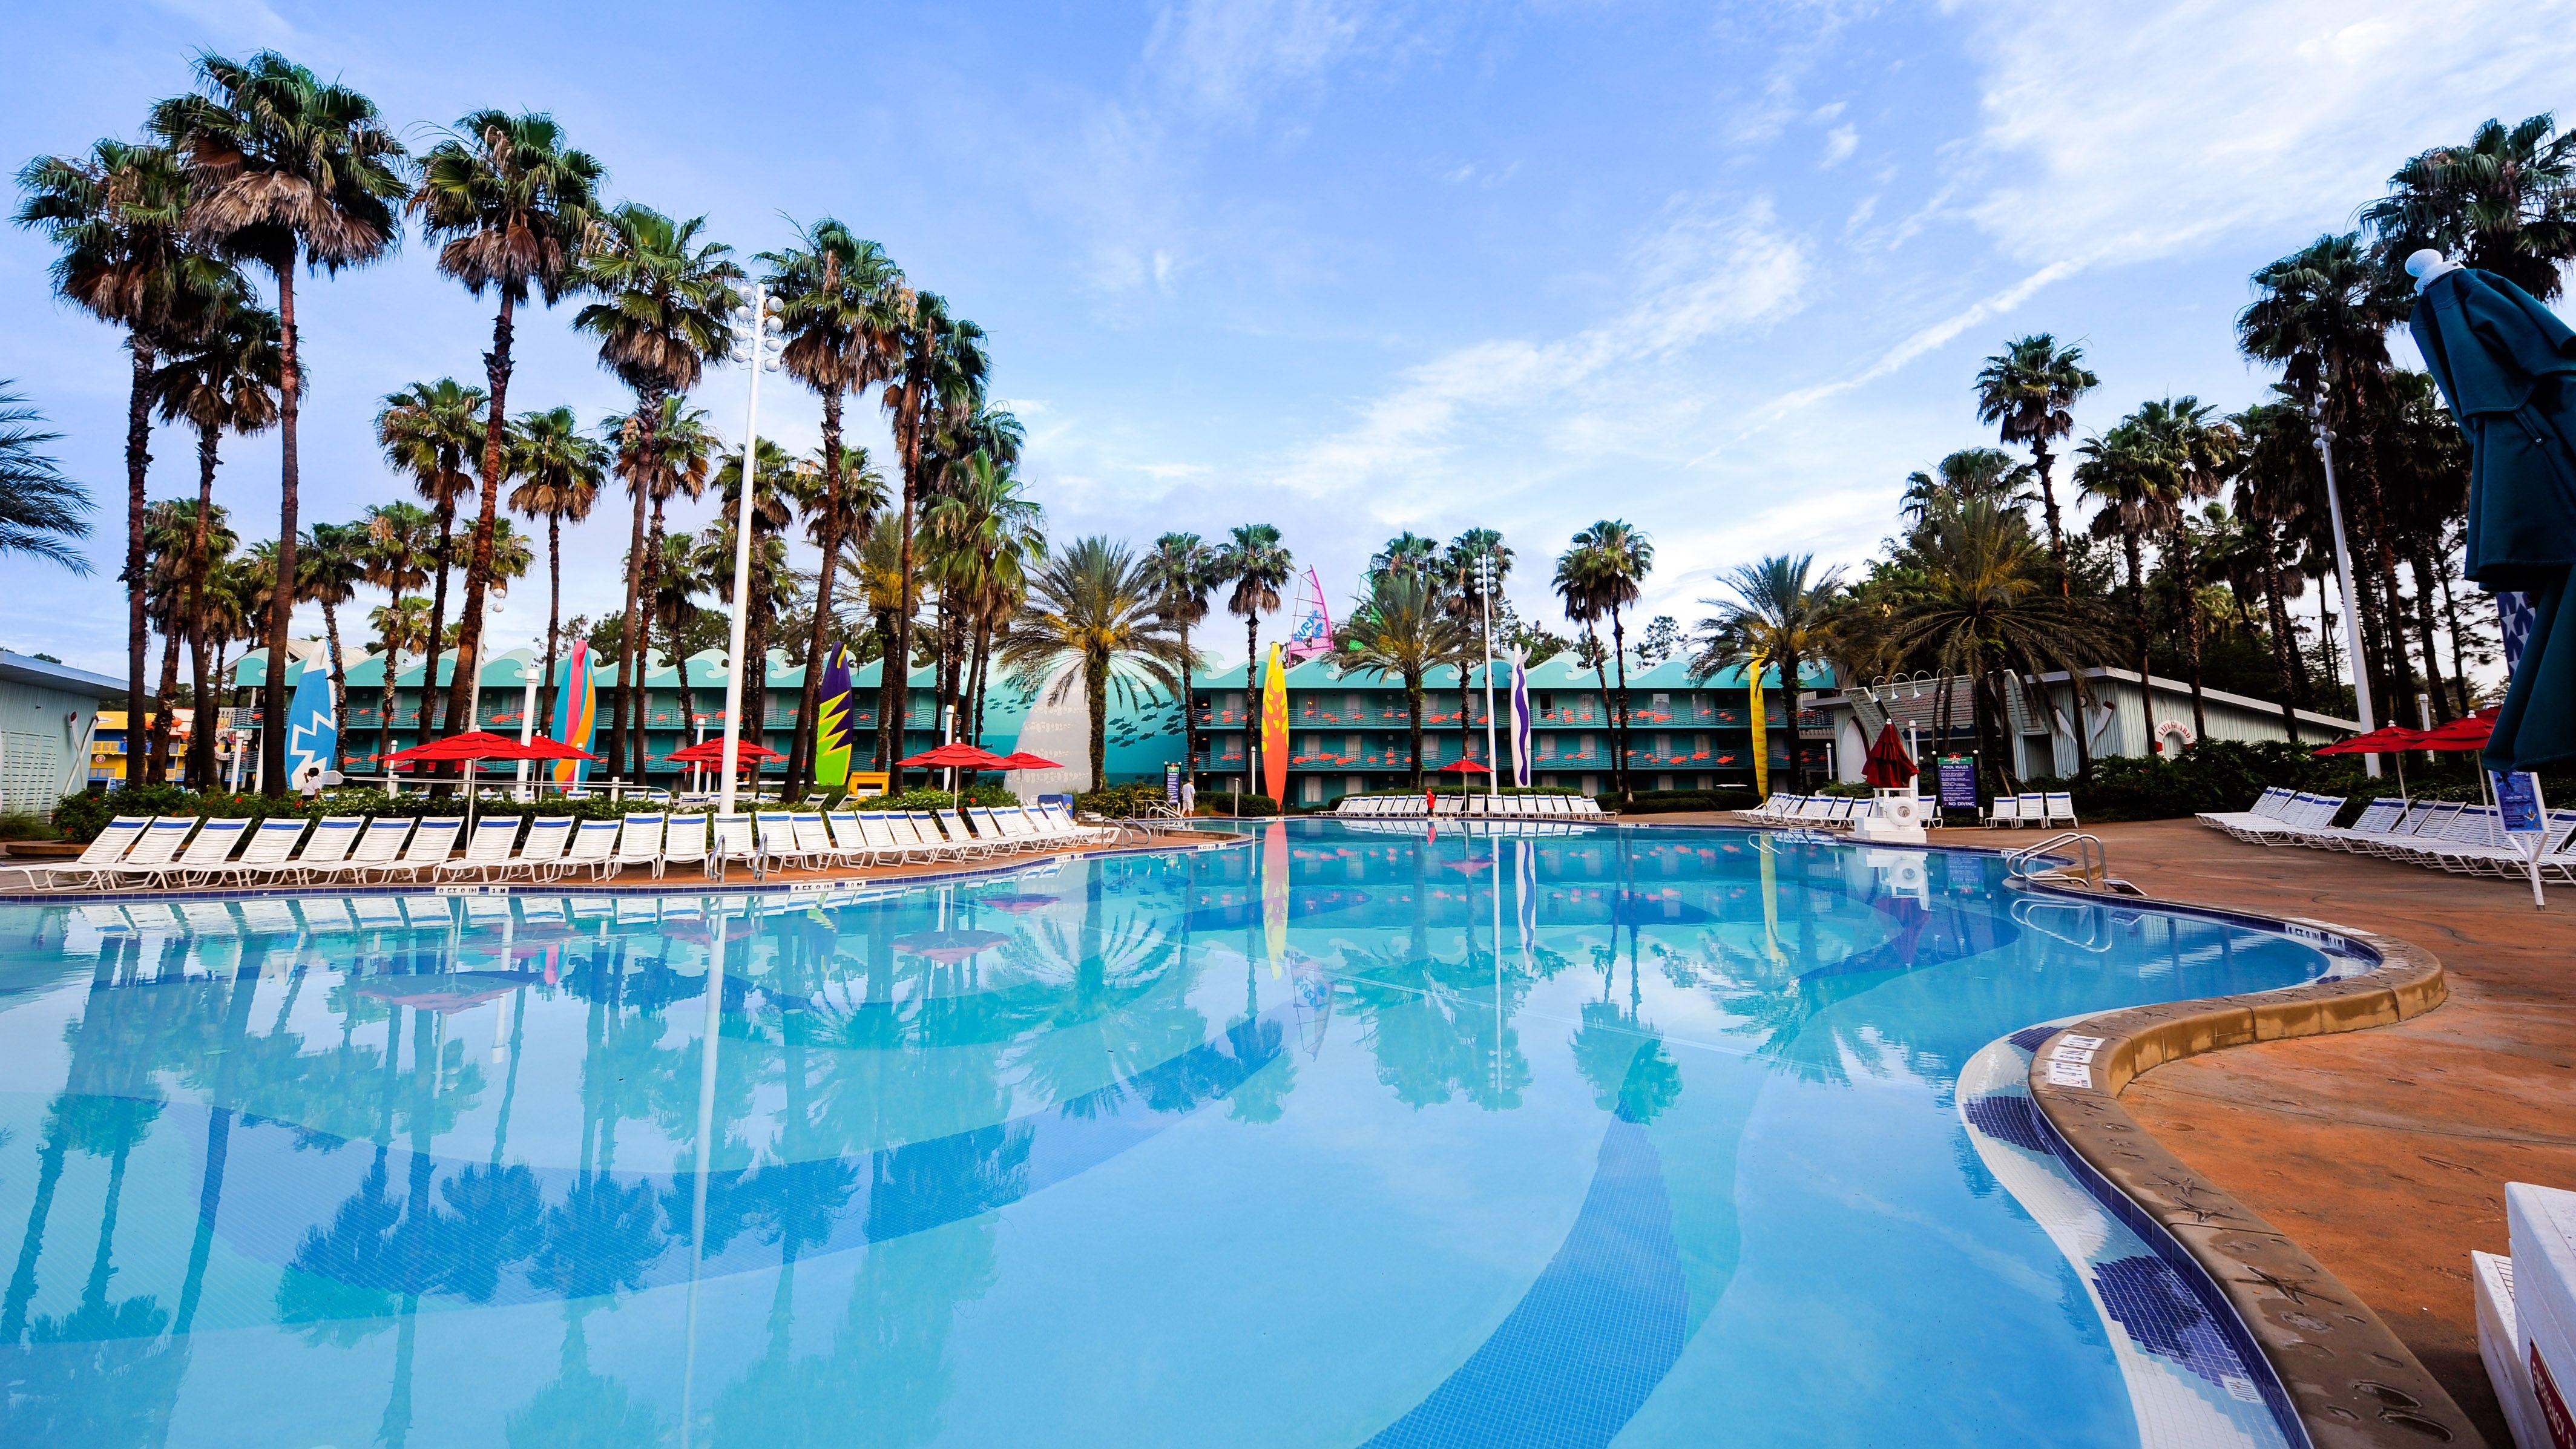 Disney swimming pools